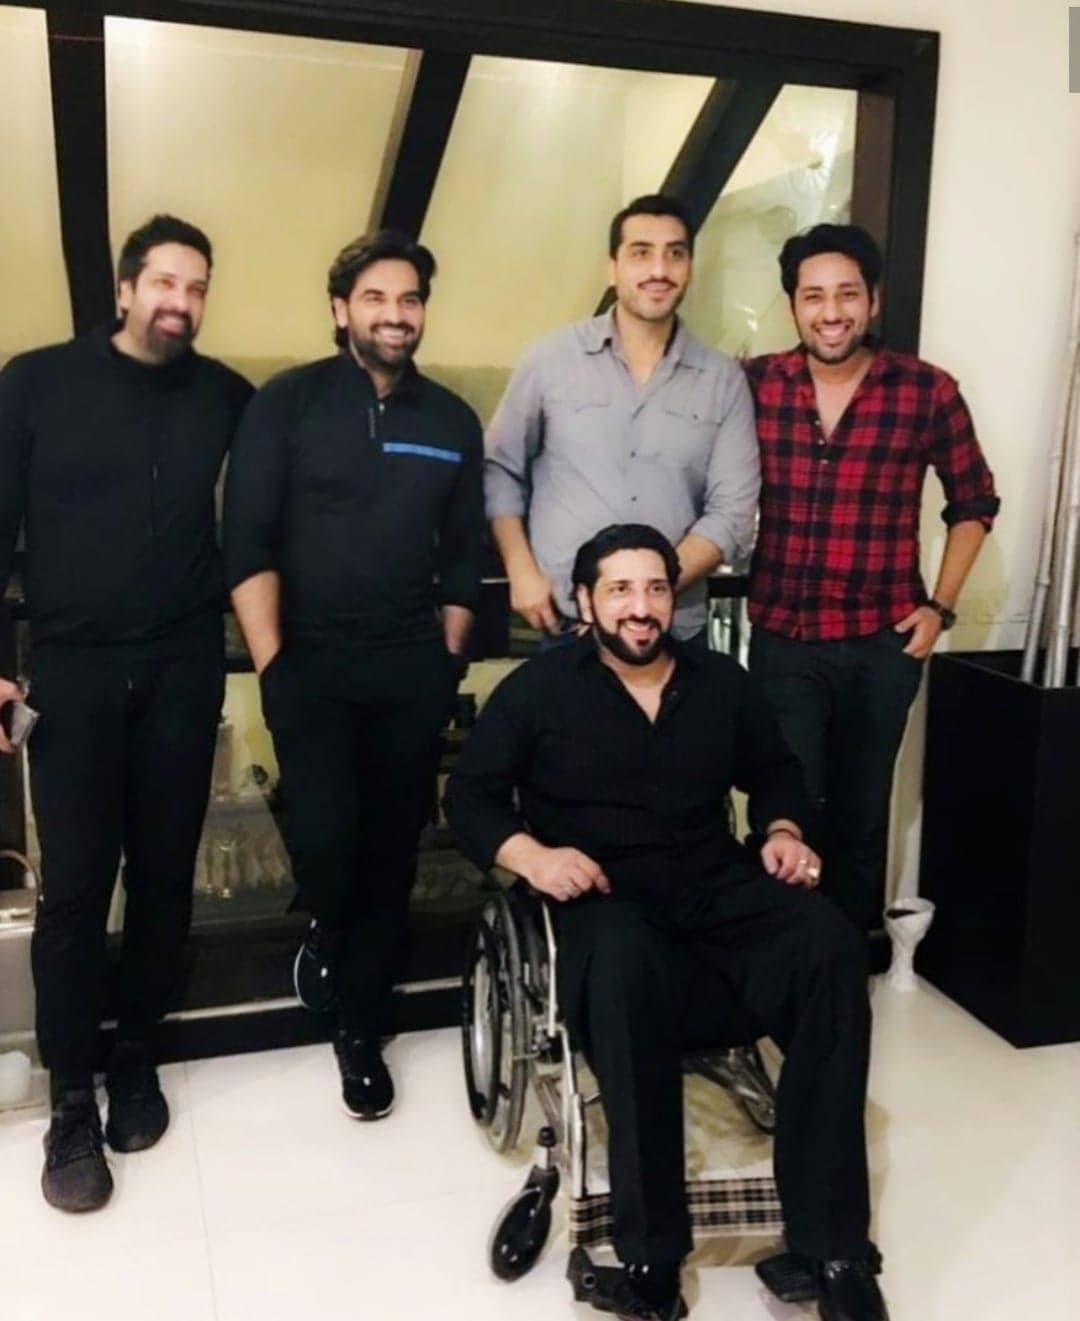 Top 20 Photos of Pakistani Celebrities from 2019